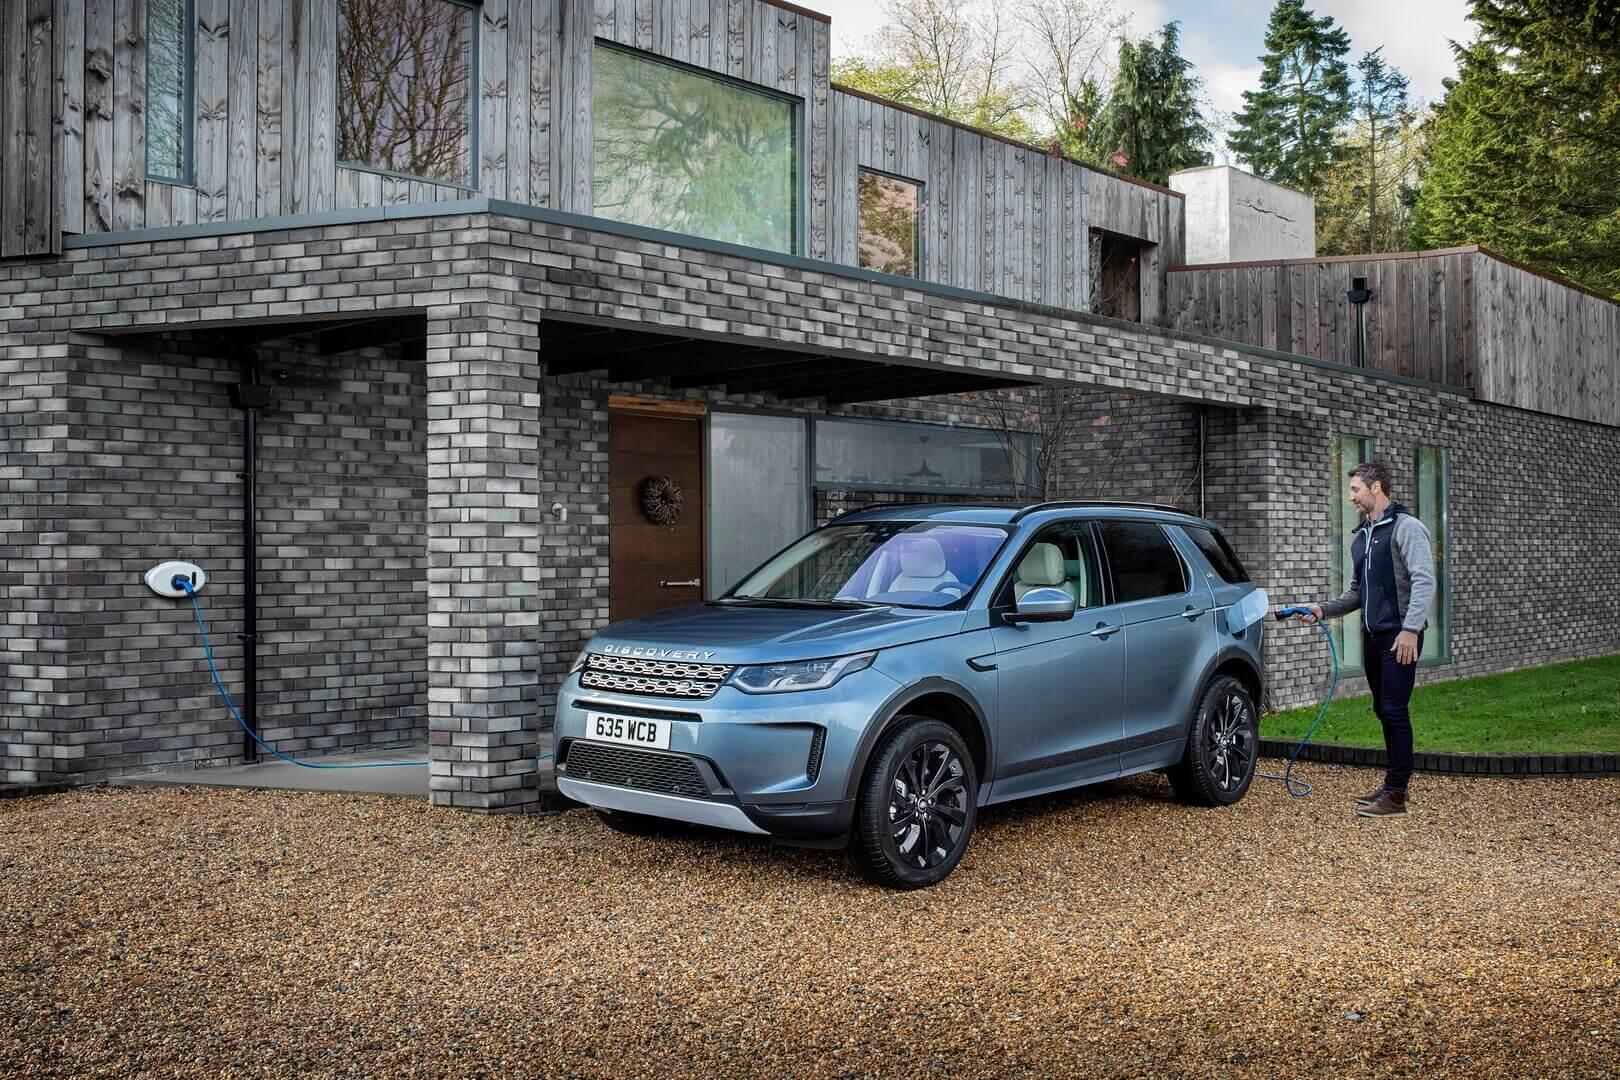 Плагин-гибрид Land Rover Discovery Sport P300e